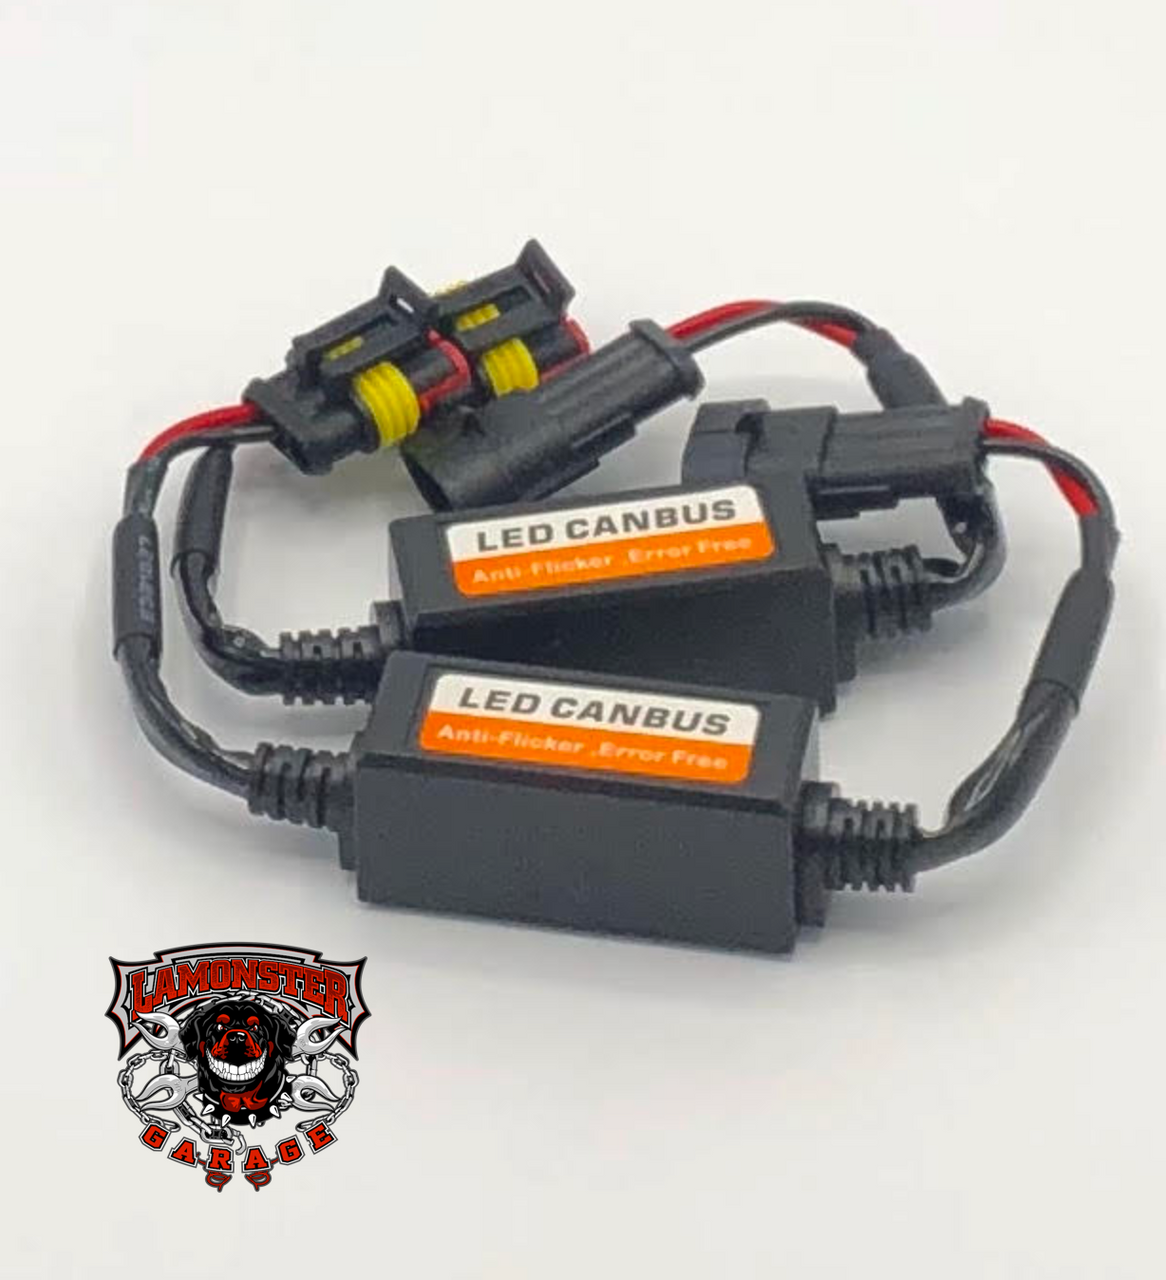 Lamonster Anti-RF Filters for the F3 Fog Lights (LG-3000)(LG-3001)(LG-3011) (LG-3016)